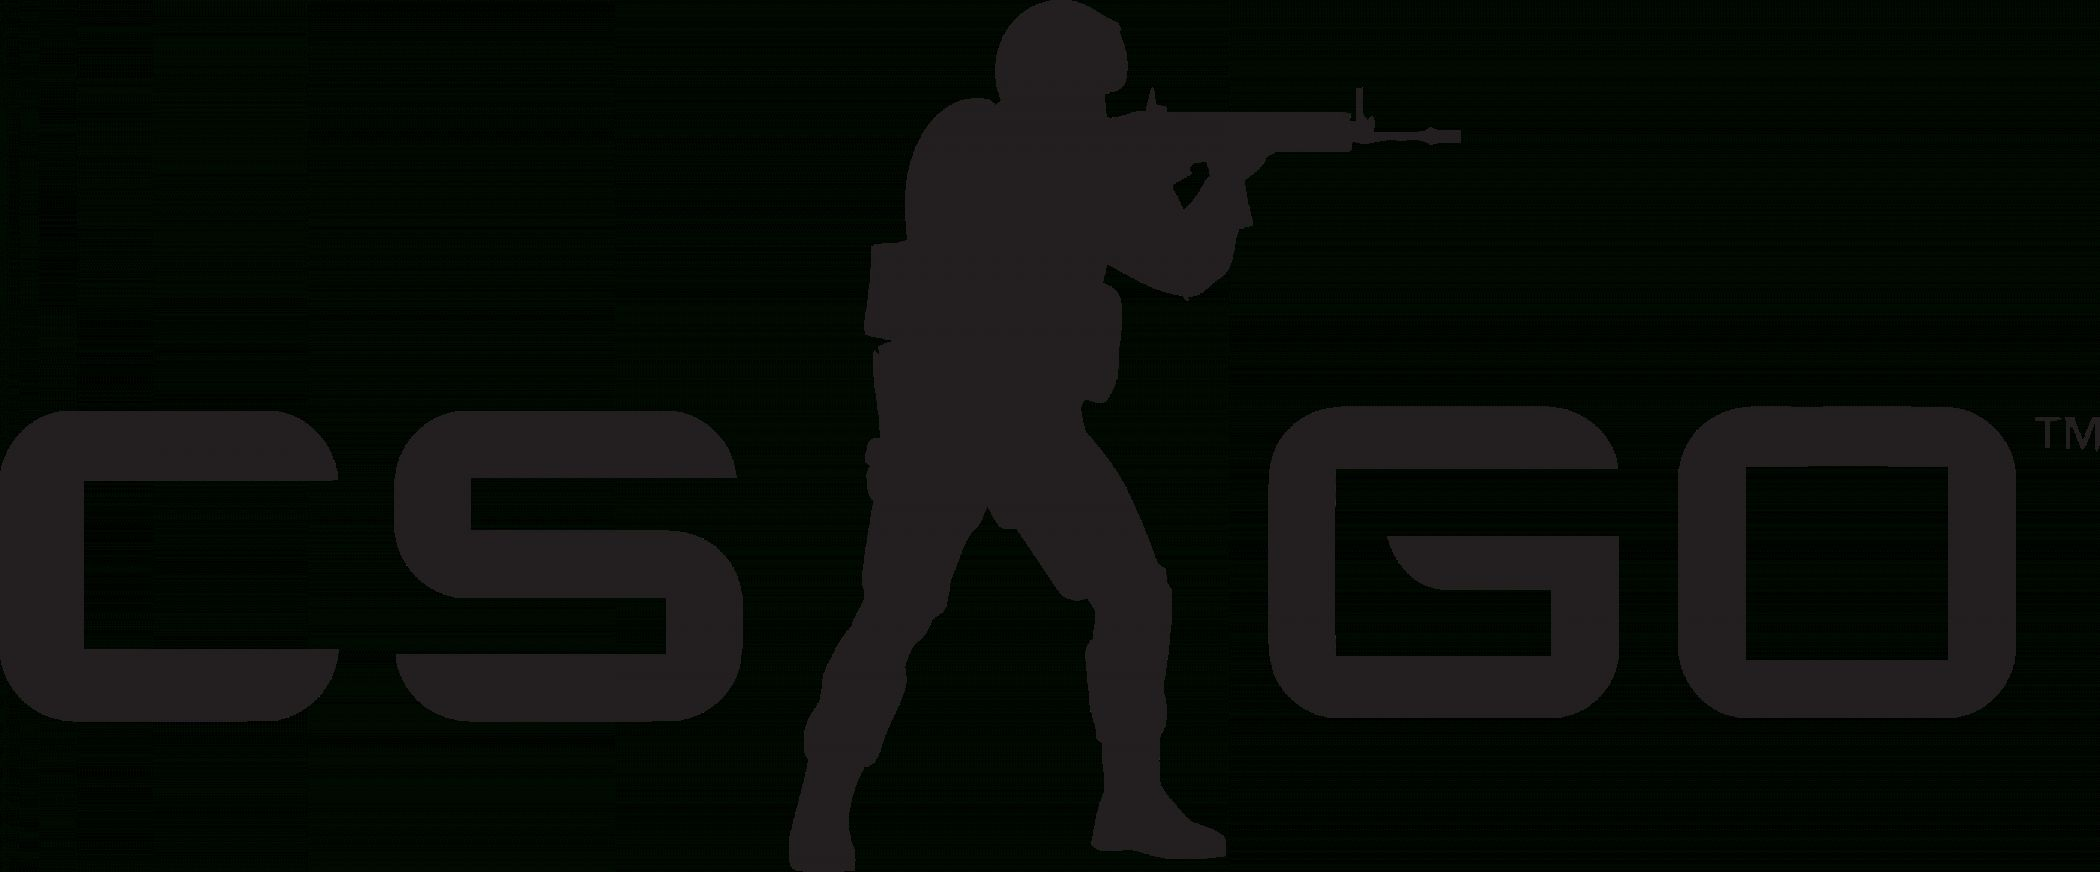 16 Counter Strike Global Offensive Logo Png Transparent Background Png Background